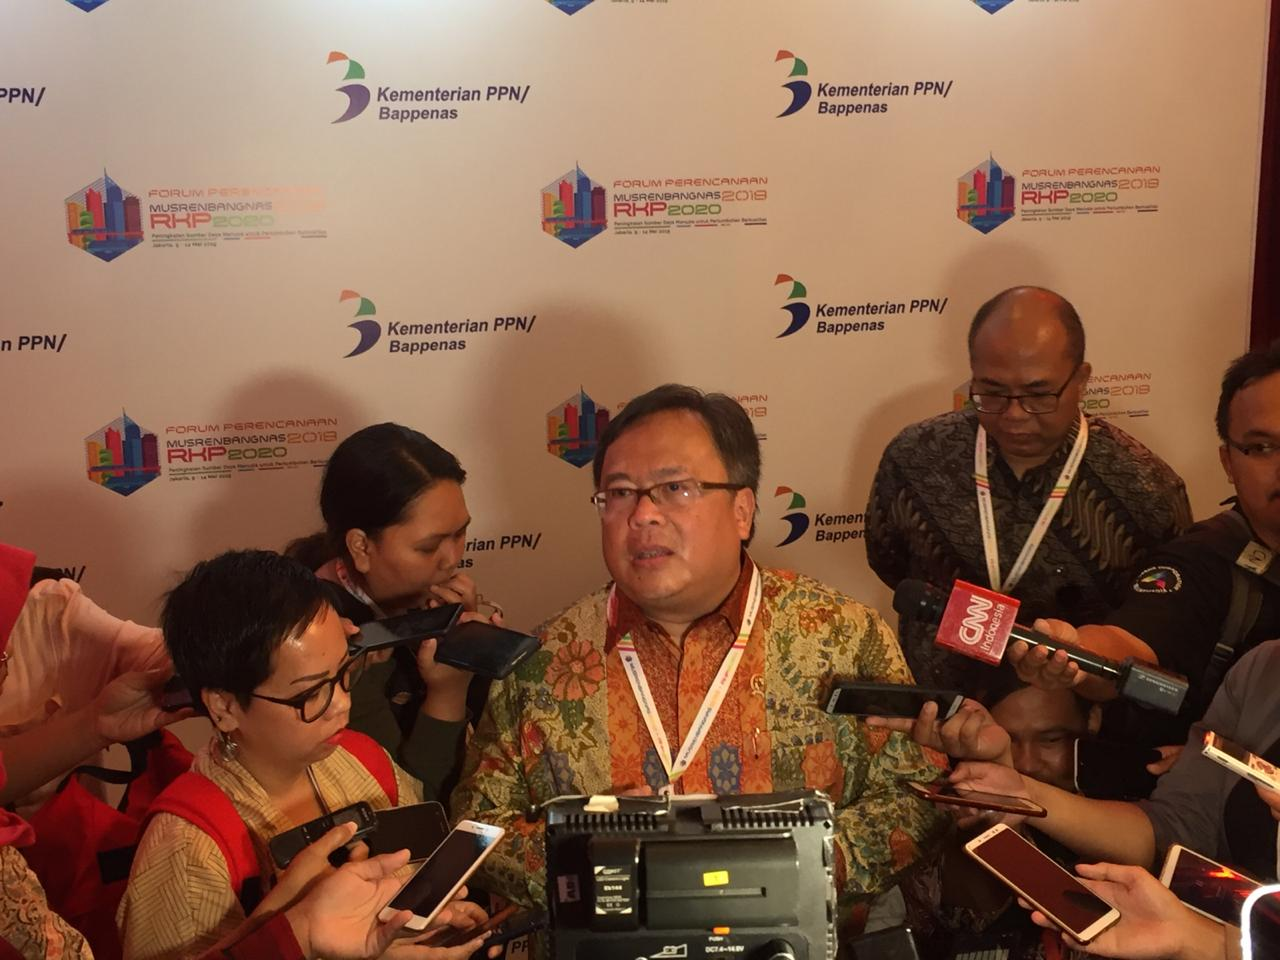 https: img-z.okeinfo.net content 2019 05 09 20 2053485 4-syarat-agar-ekonomi-indonesia-terbesar-nomor-5-di-dunia-m6RboFNhrT.jpeg